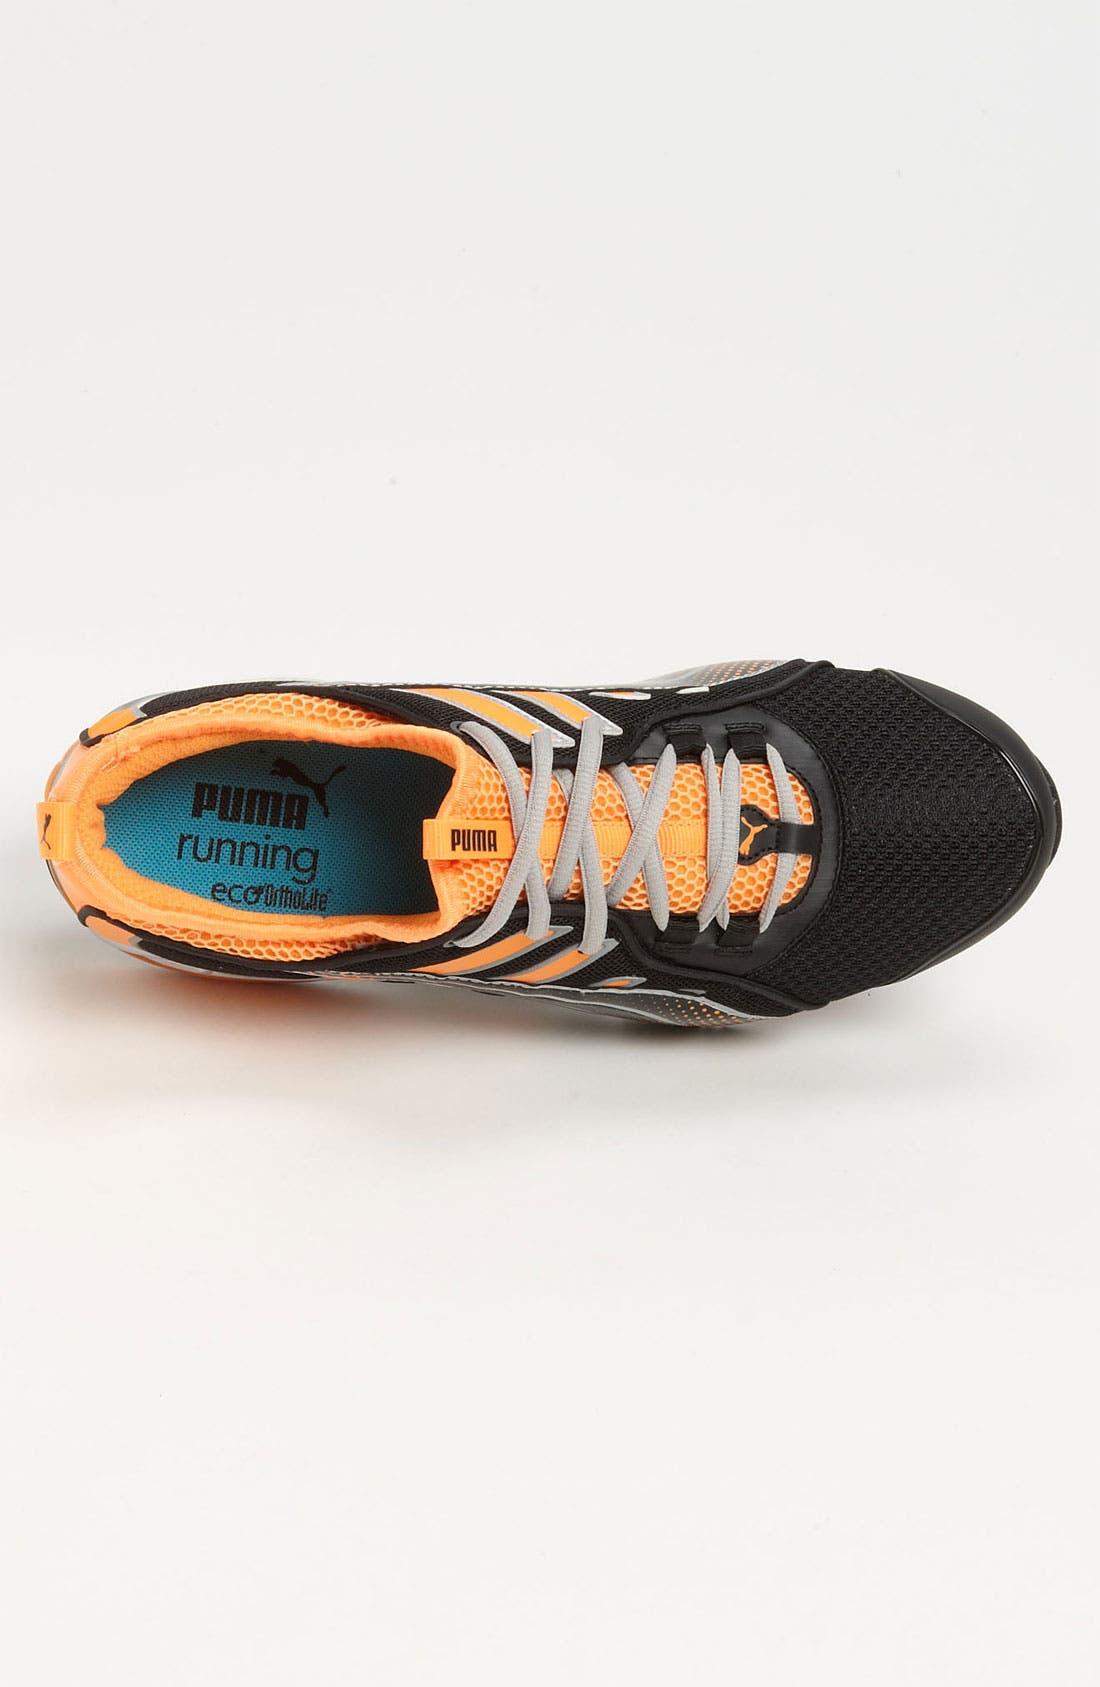 PUMA,                             'Voltaic 4 M' Training Shoe,                             Alternate thumbnail 2, color,                             001